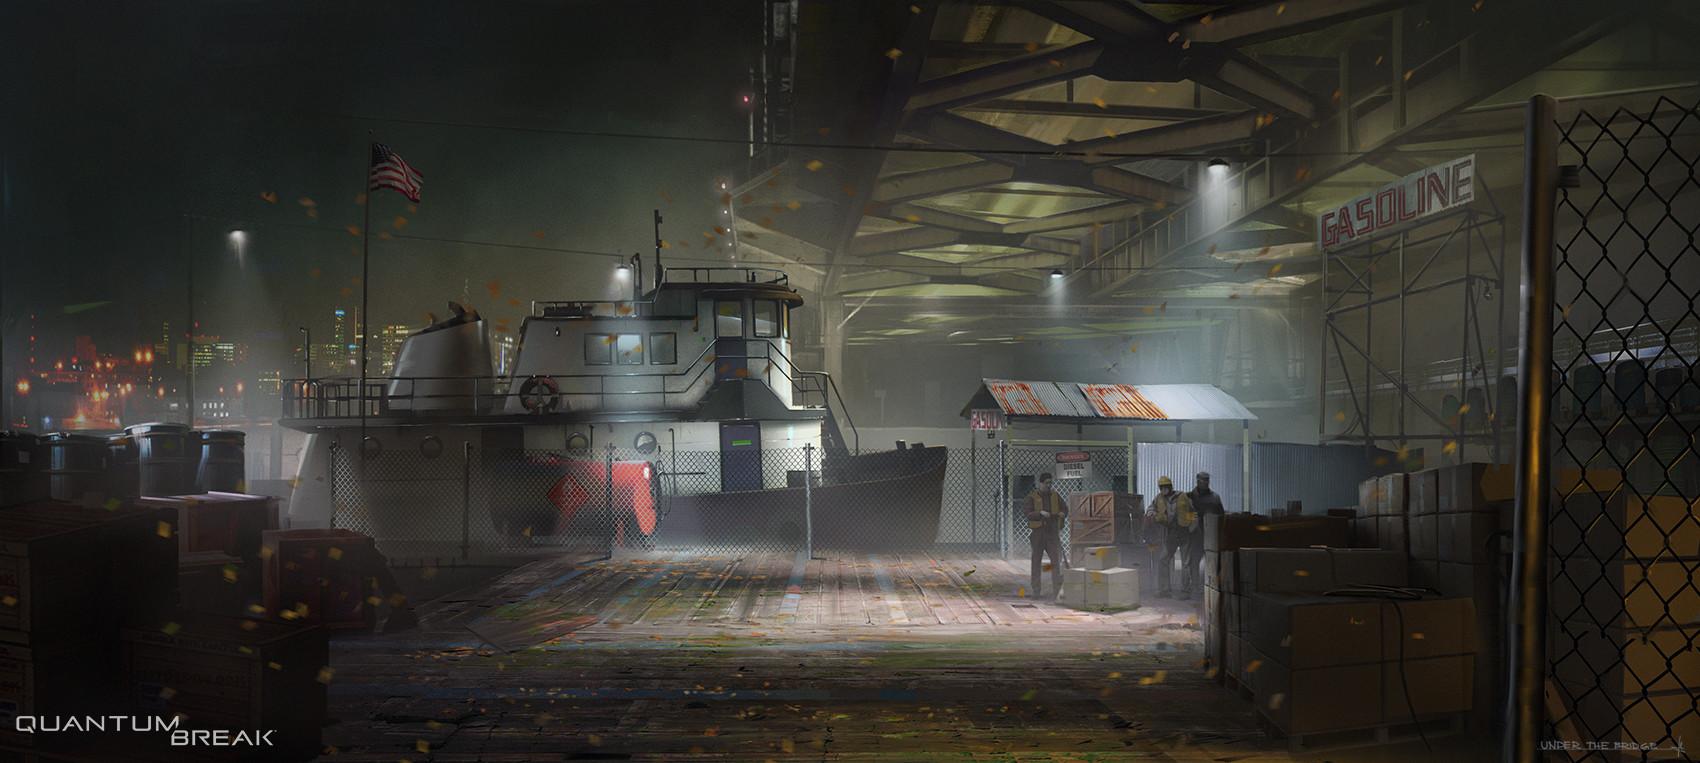 Ville Assinen - Under Bridge